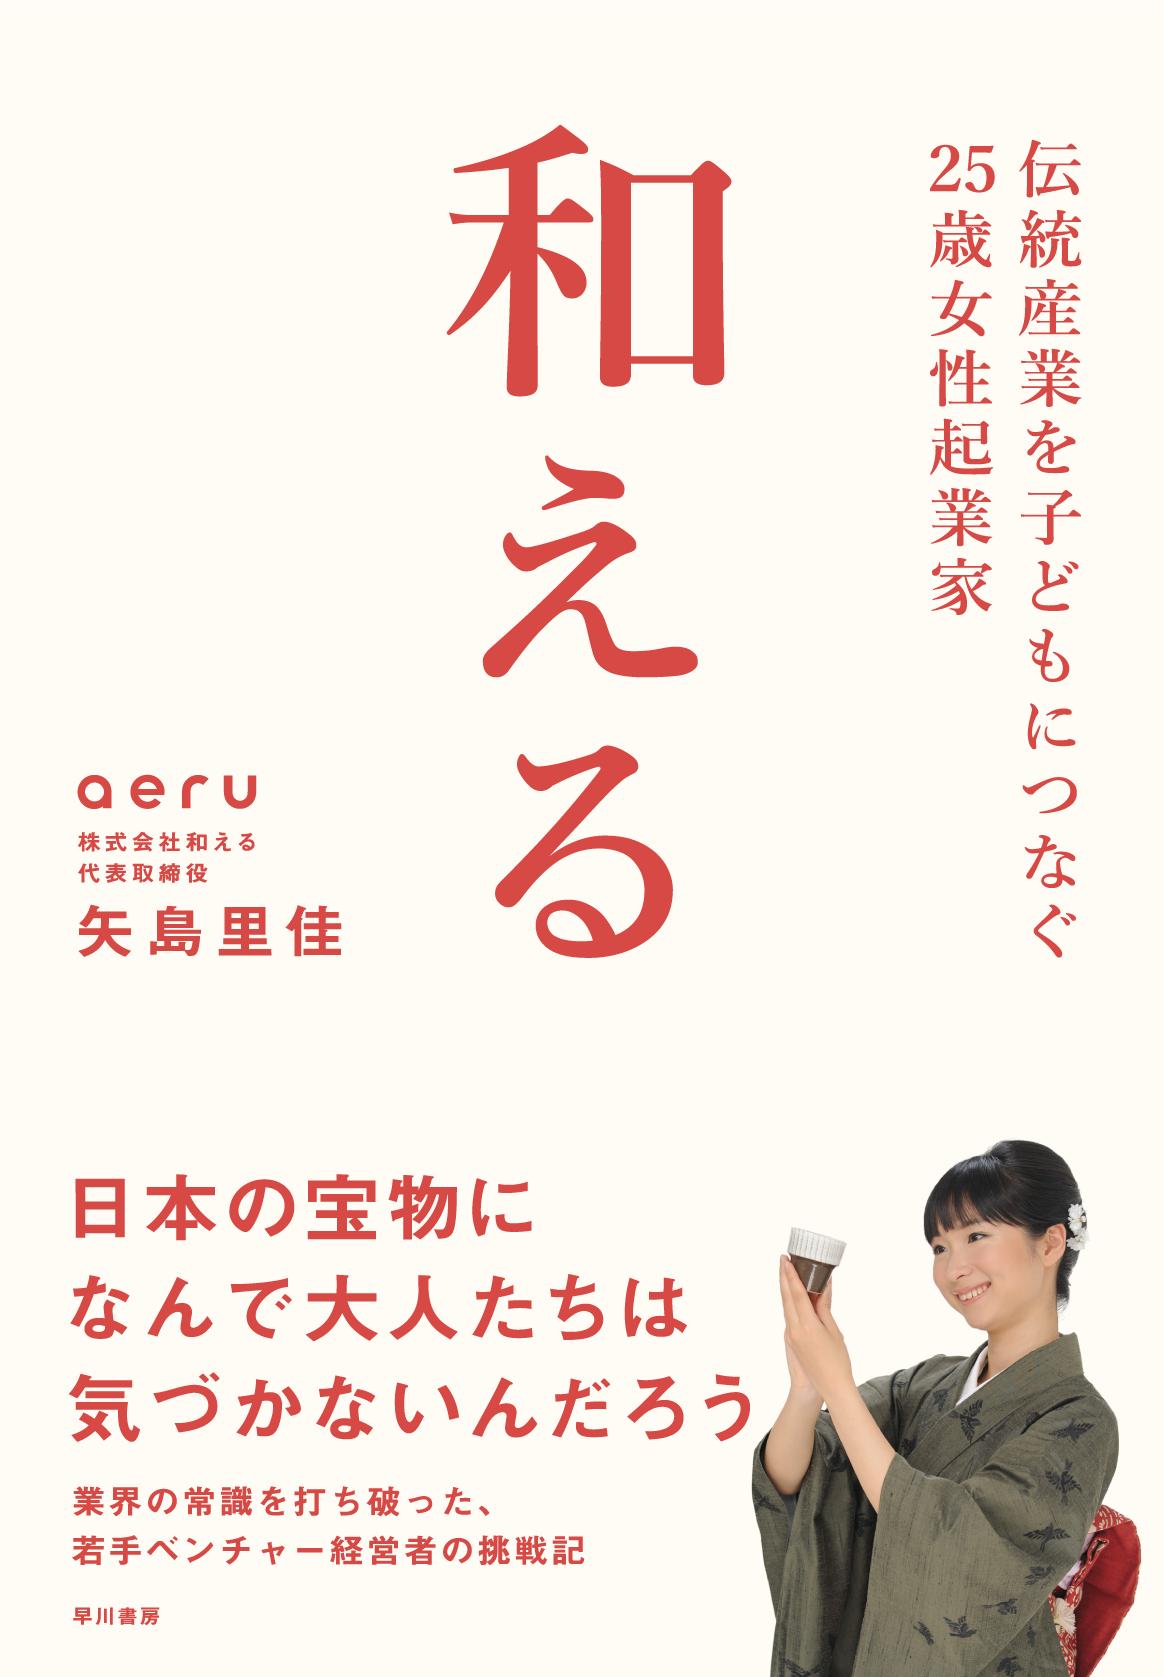 和える 矢島里佳 aeru 電子書籍化